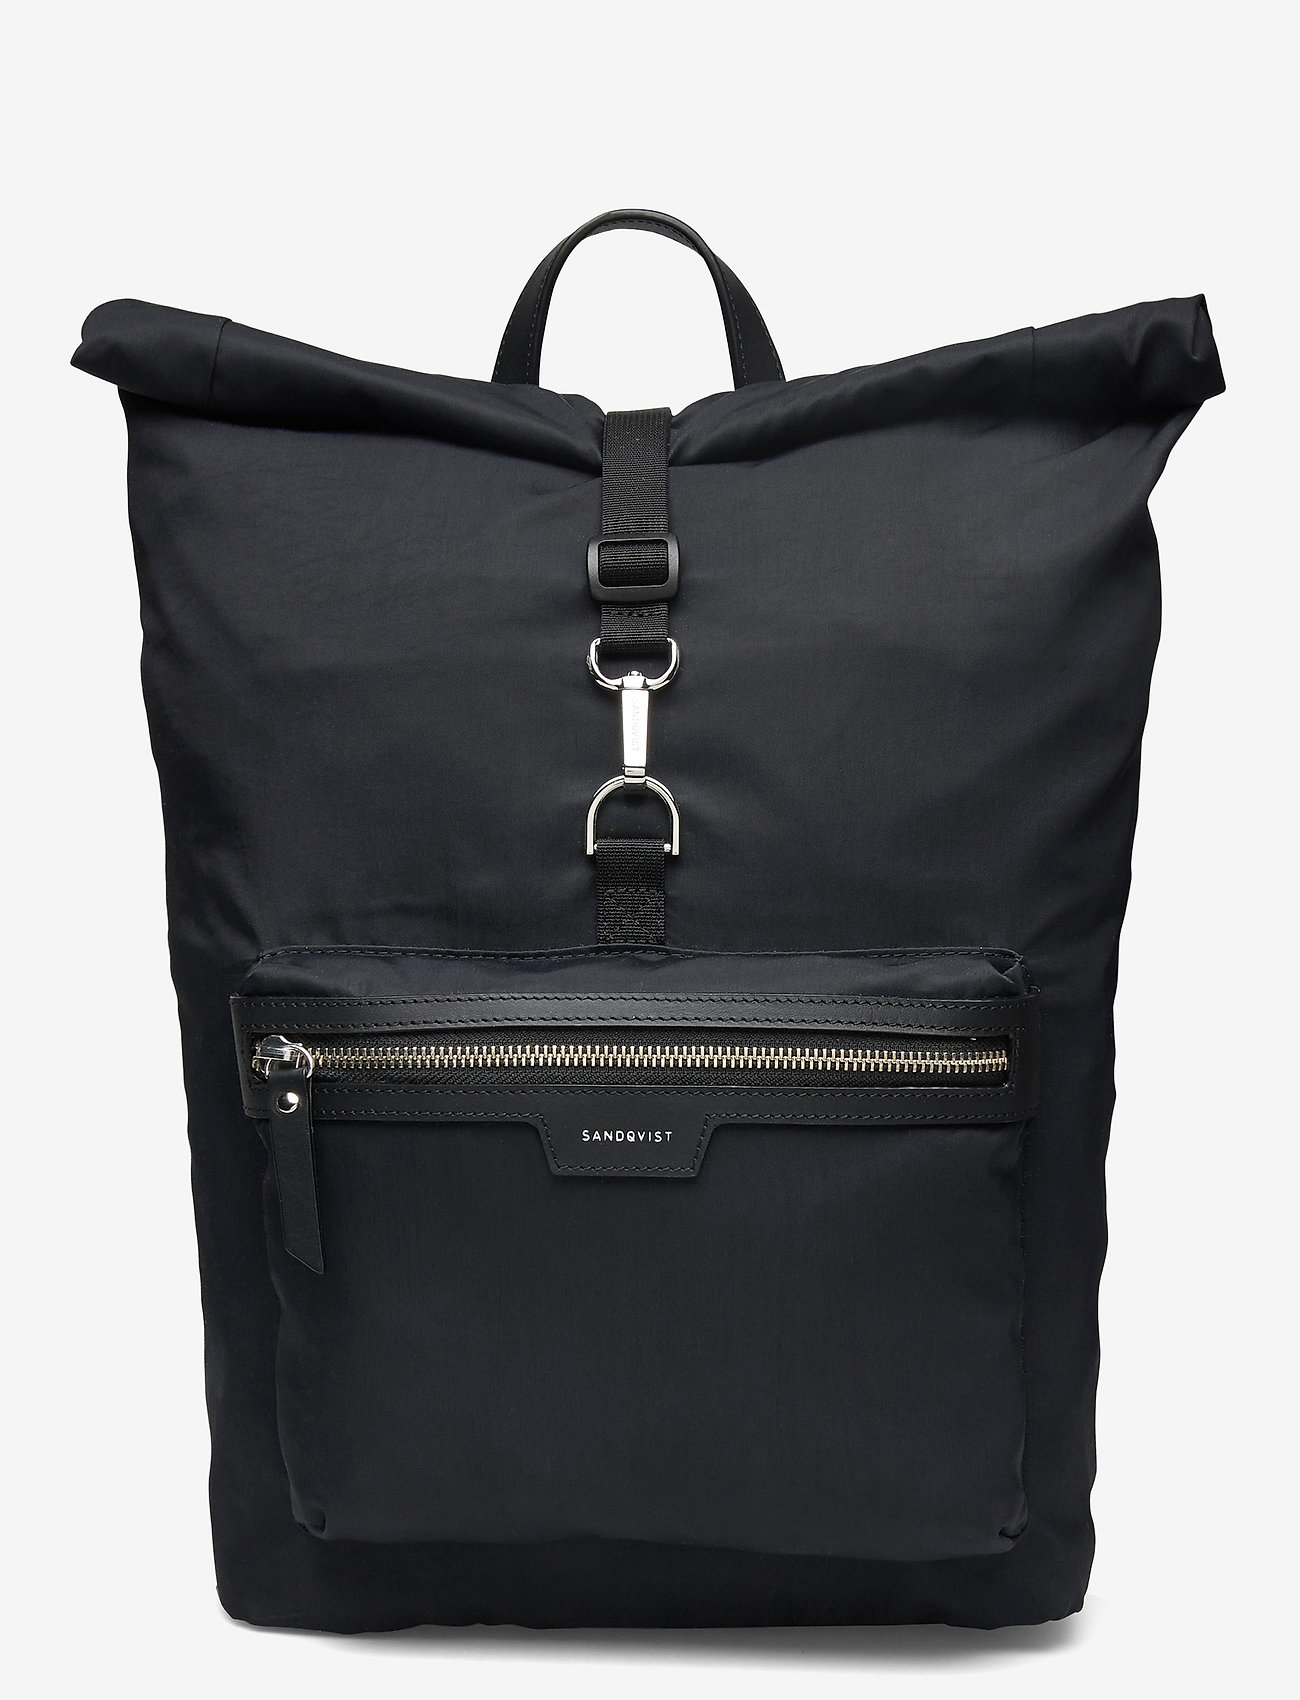 SANDQVIST - SIV - nieuwe mode - black with black leather - 1